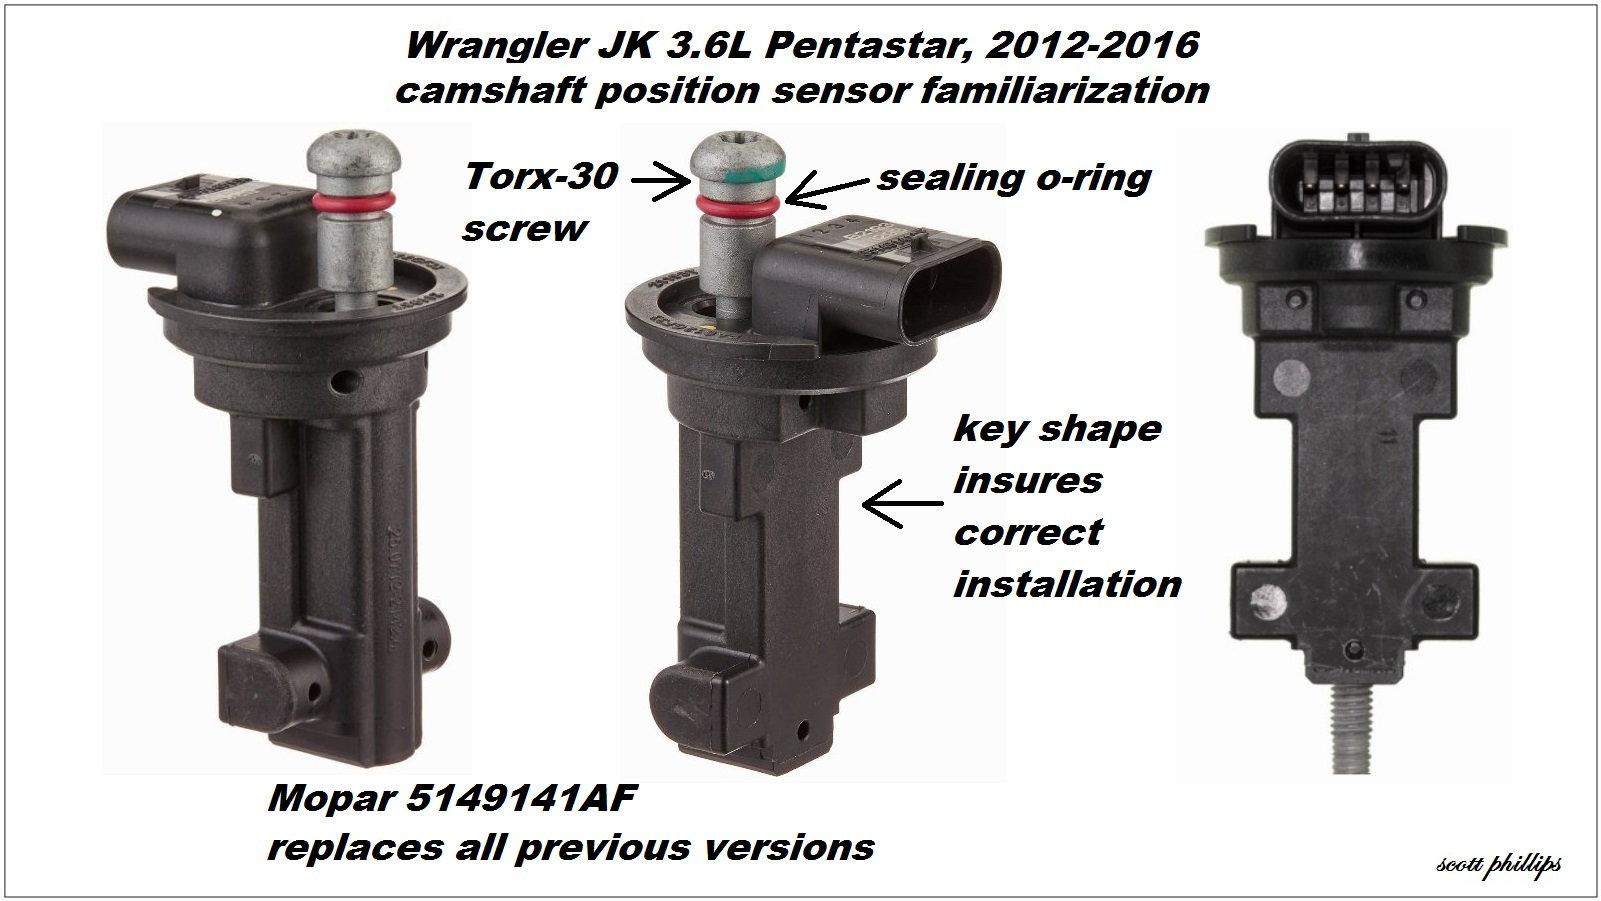 2005 jeep liberty crd wiring diagram 36 volt aussenborder wrangler egr valve location, jeep, get free image about